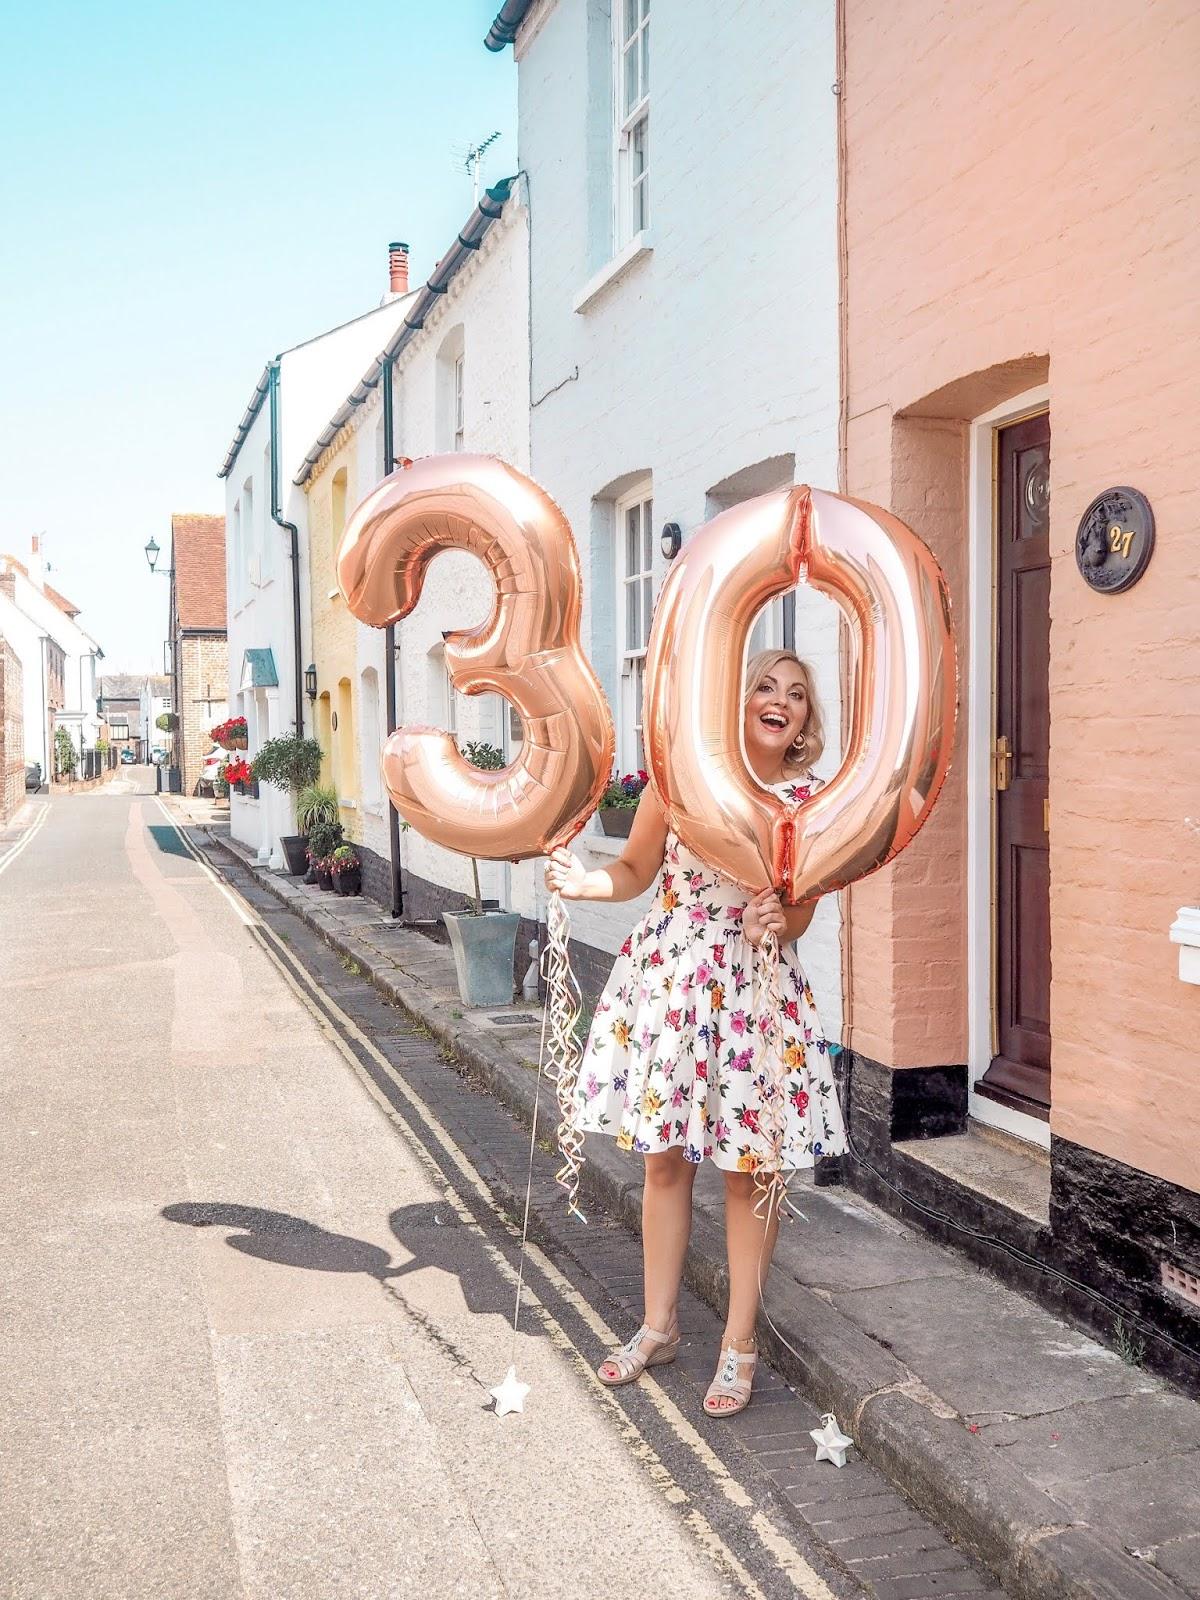 My Feelings On Turning 30, Katie Kirk Loves, UK Blogger, 30th Birthday, 30 Flirty and Thriving, UK Fashion Blogger, UK Lifestyle Blogger, Turning 30 In Style, Over 30s Fashion, 30 and Fabulous, Milestone Birthday, Party Blogger, Vintage Tea Dress